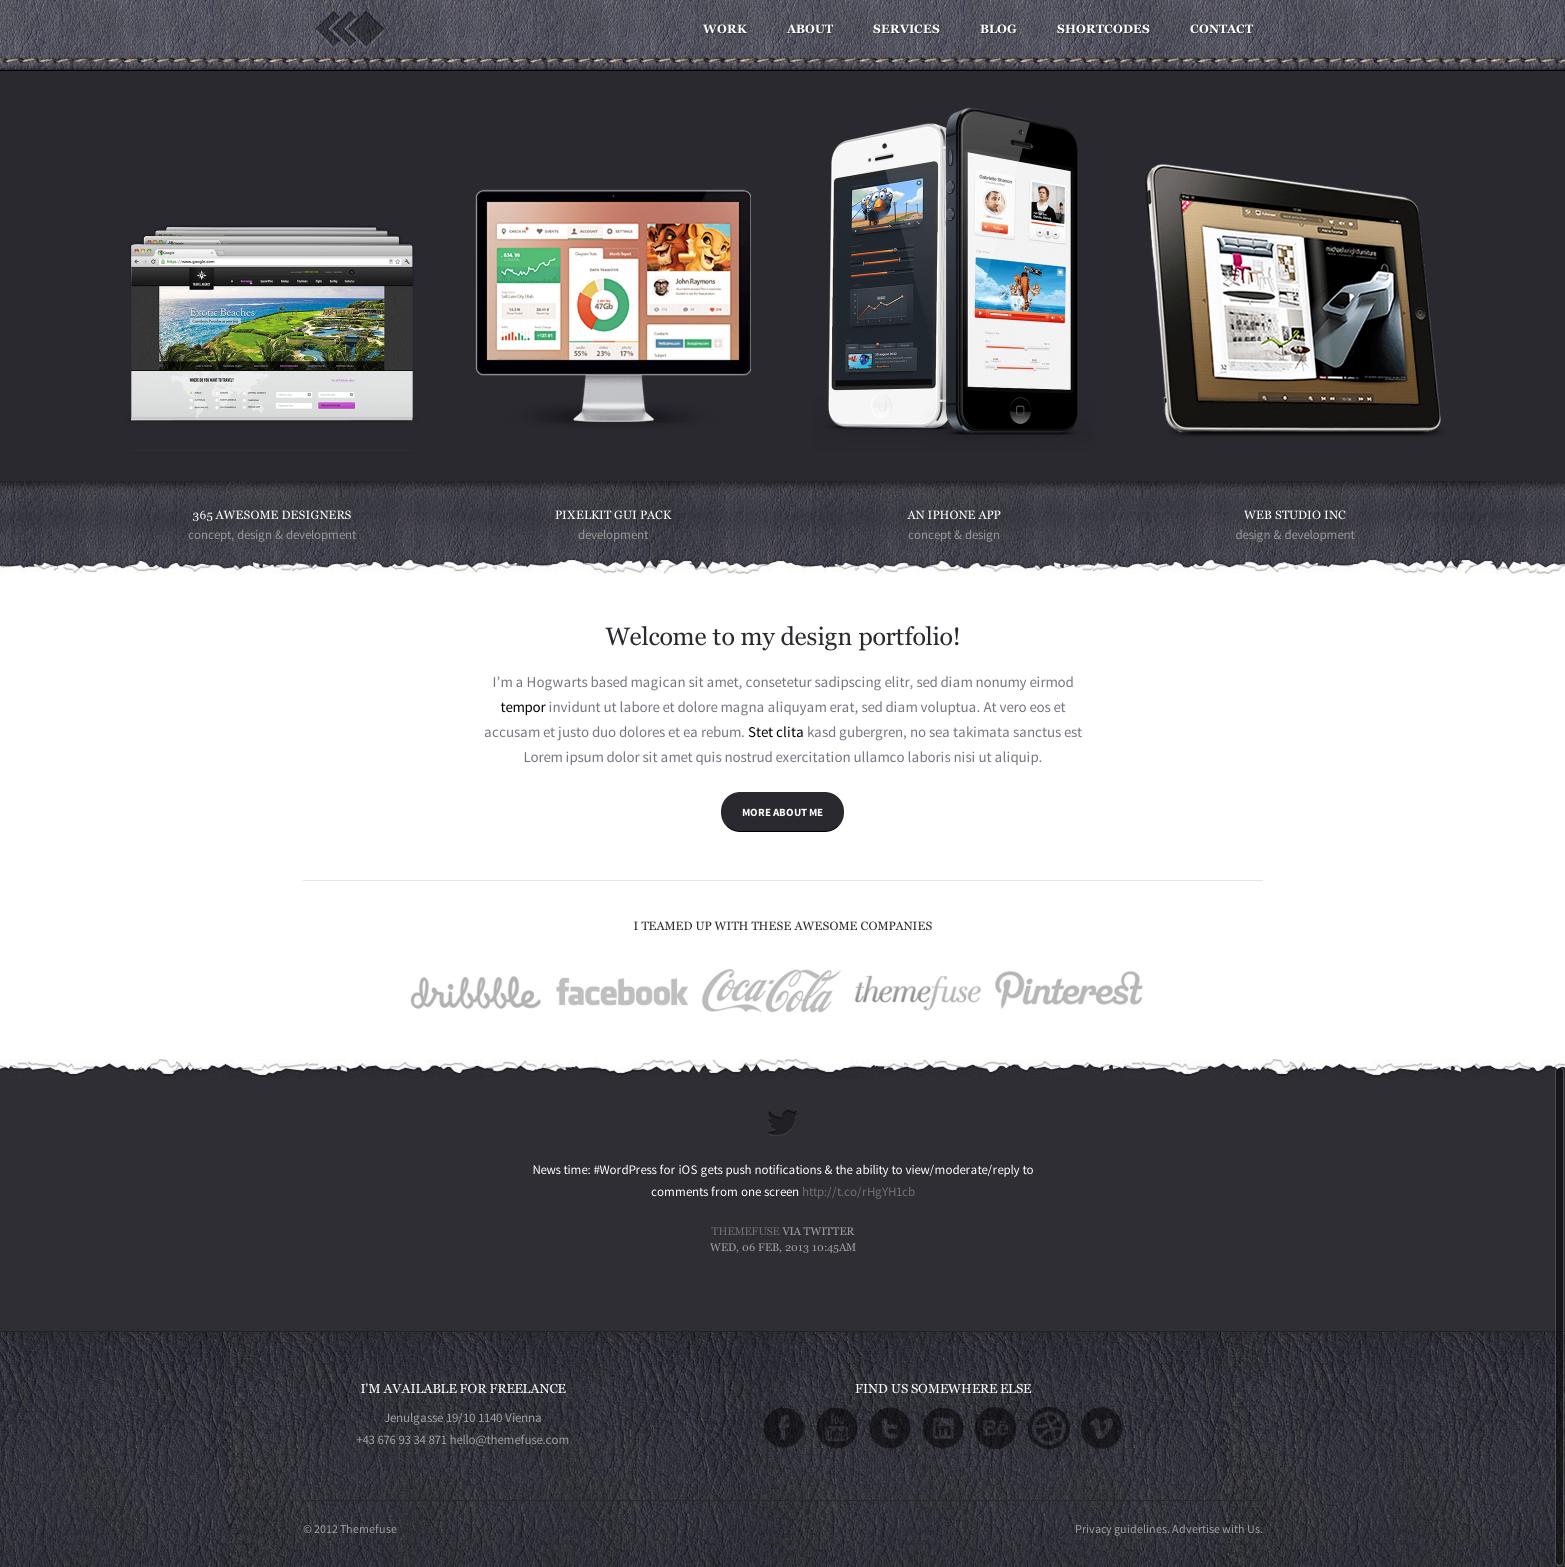 PixelWhiz WordPress Theme by ThemeFuse